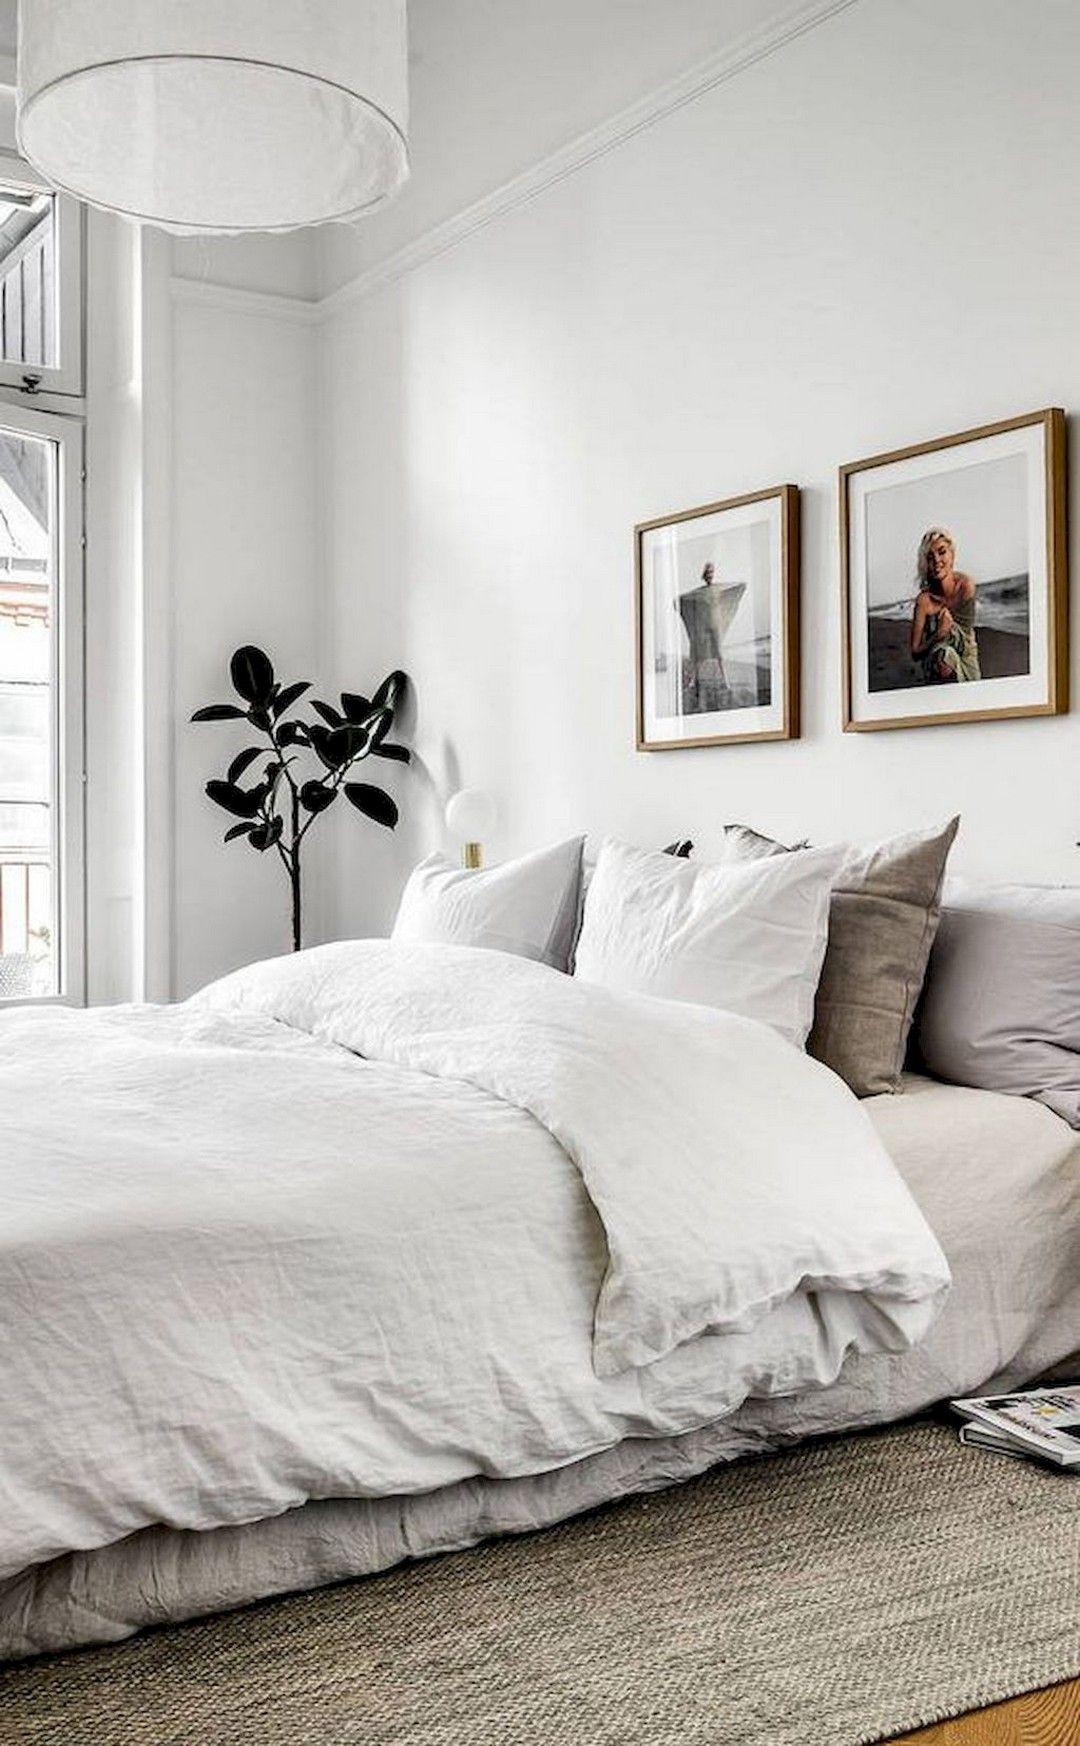 20 Modern and Stylish Rustic Scandinavian Bedroom Decor https://www.decomagz.com/2017/09/28/20-modern-stylish-rustic-scandinavian-bedroom-decor/